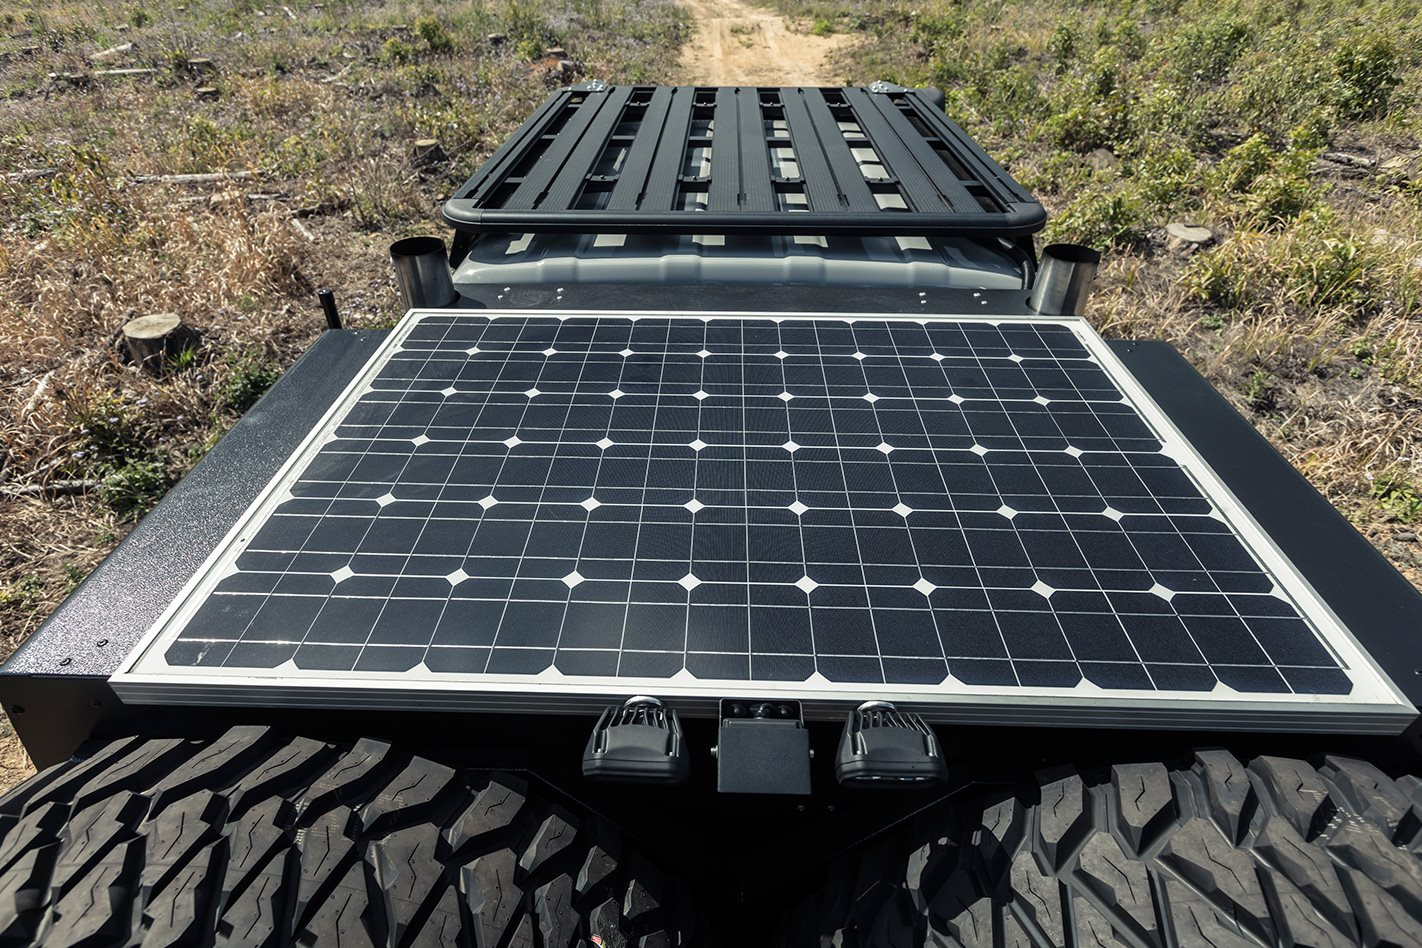 Patriot-Campers-6x6-Toyota-LC79-solar-panel.jpg